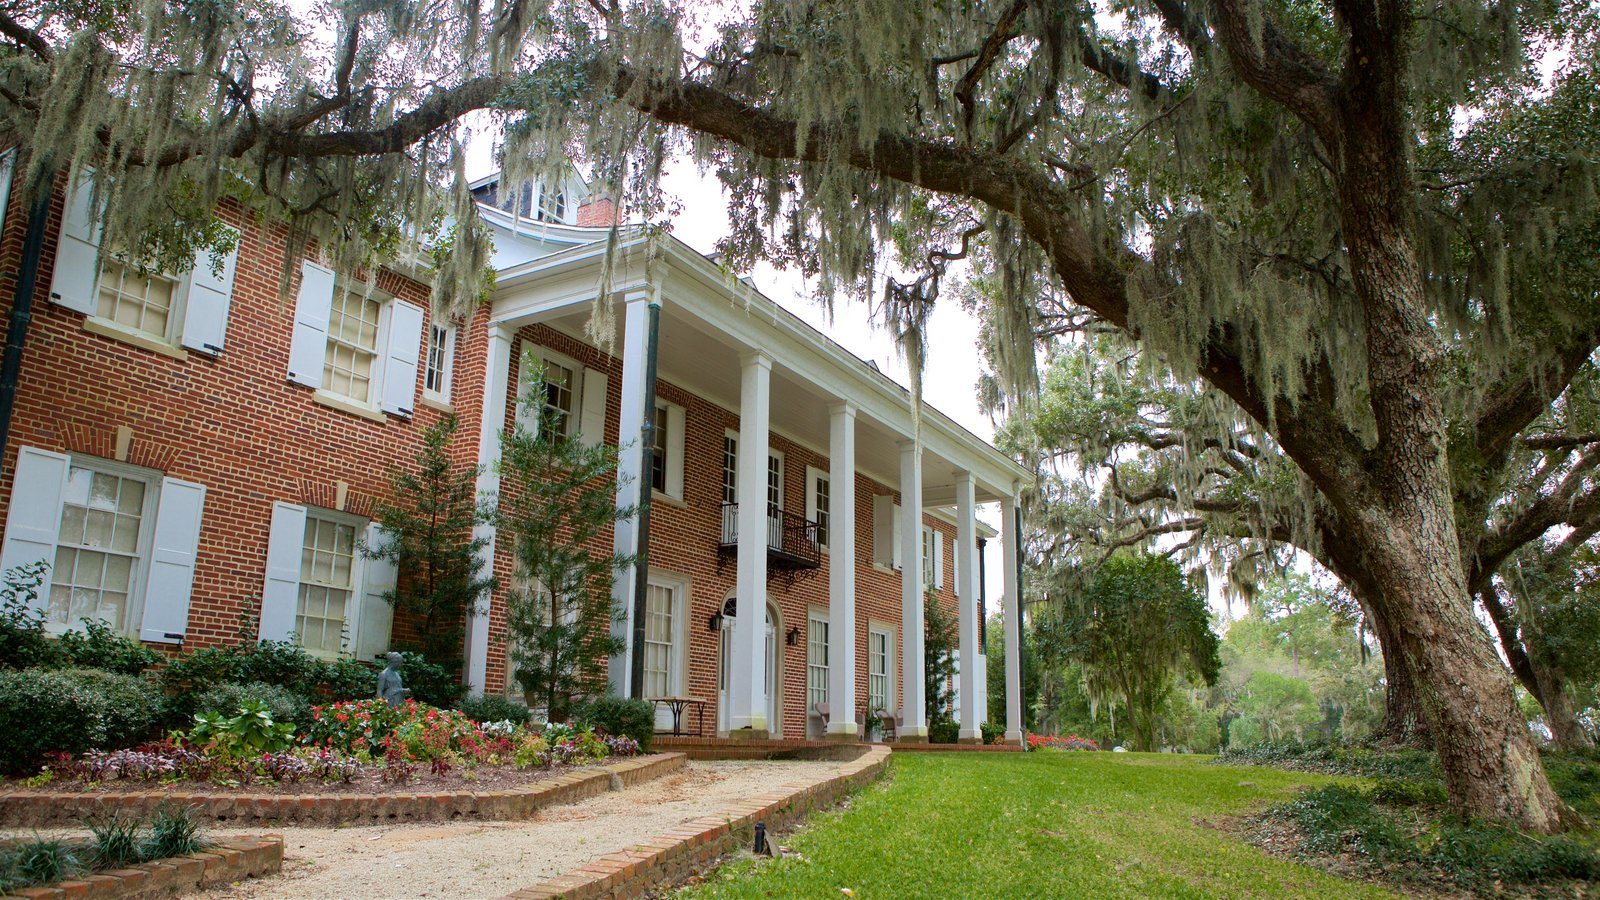 Georgetown caracterizando uma casa e elementos de patrimônio